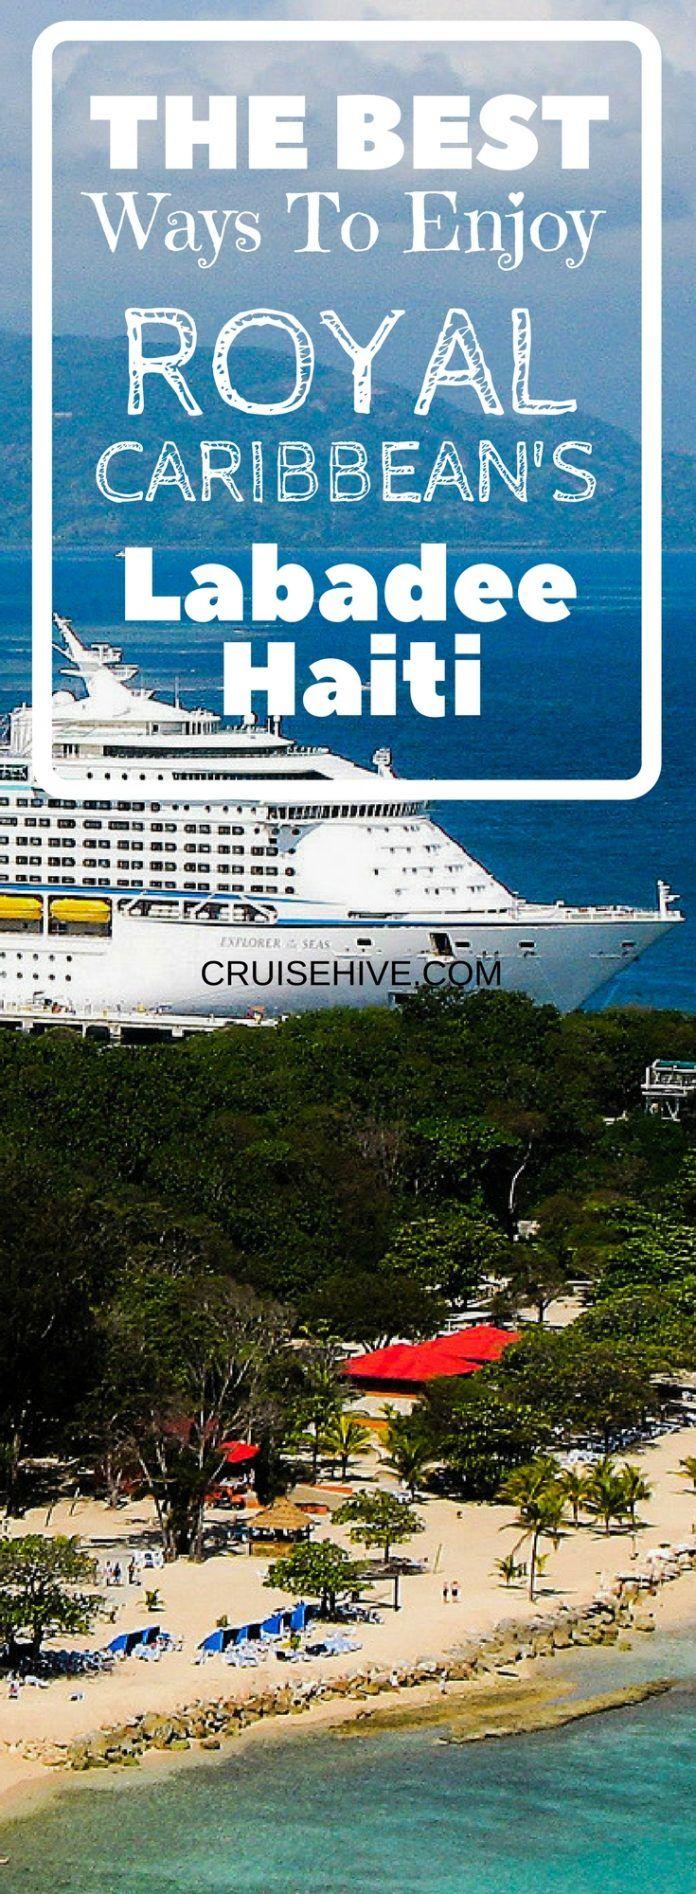 The Best Ways to Enjoy Royal Caribbean s Labadee Haiti